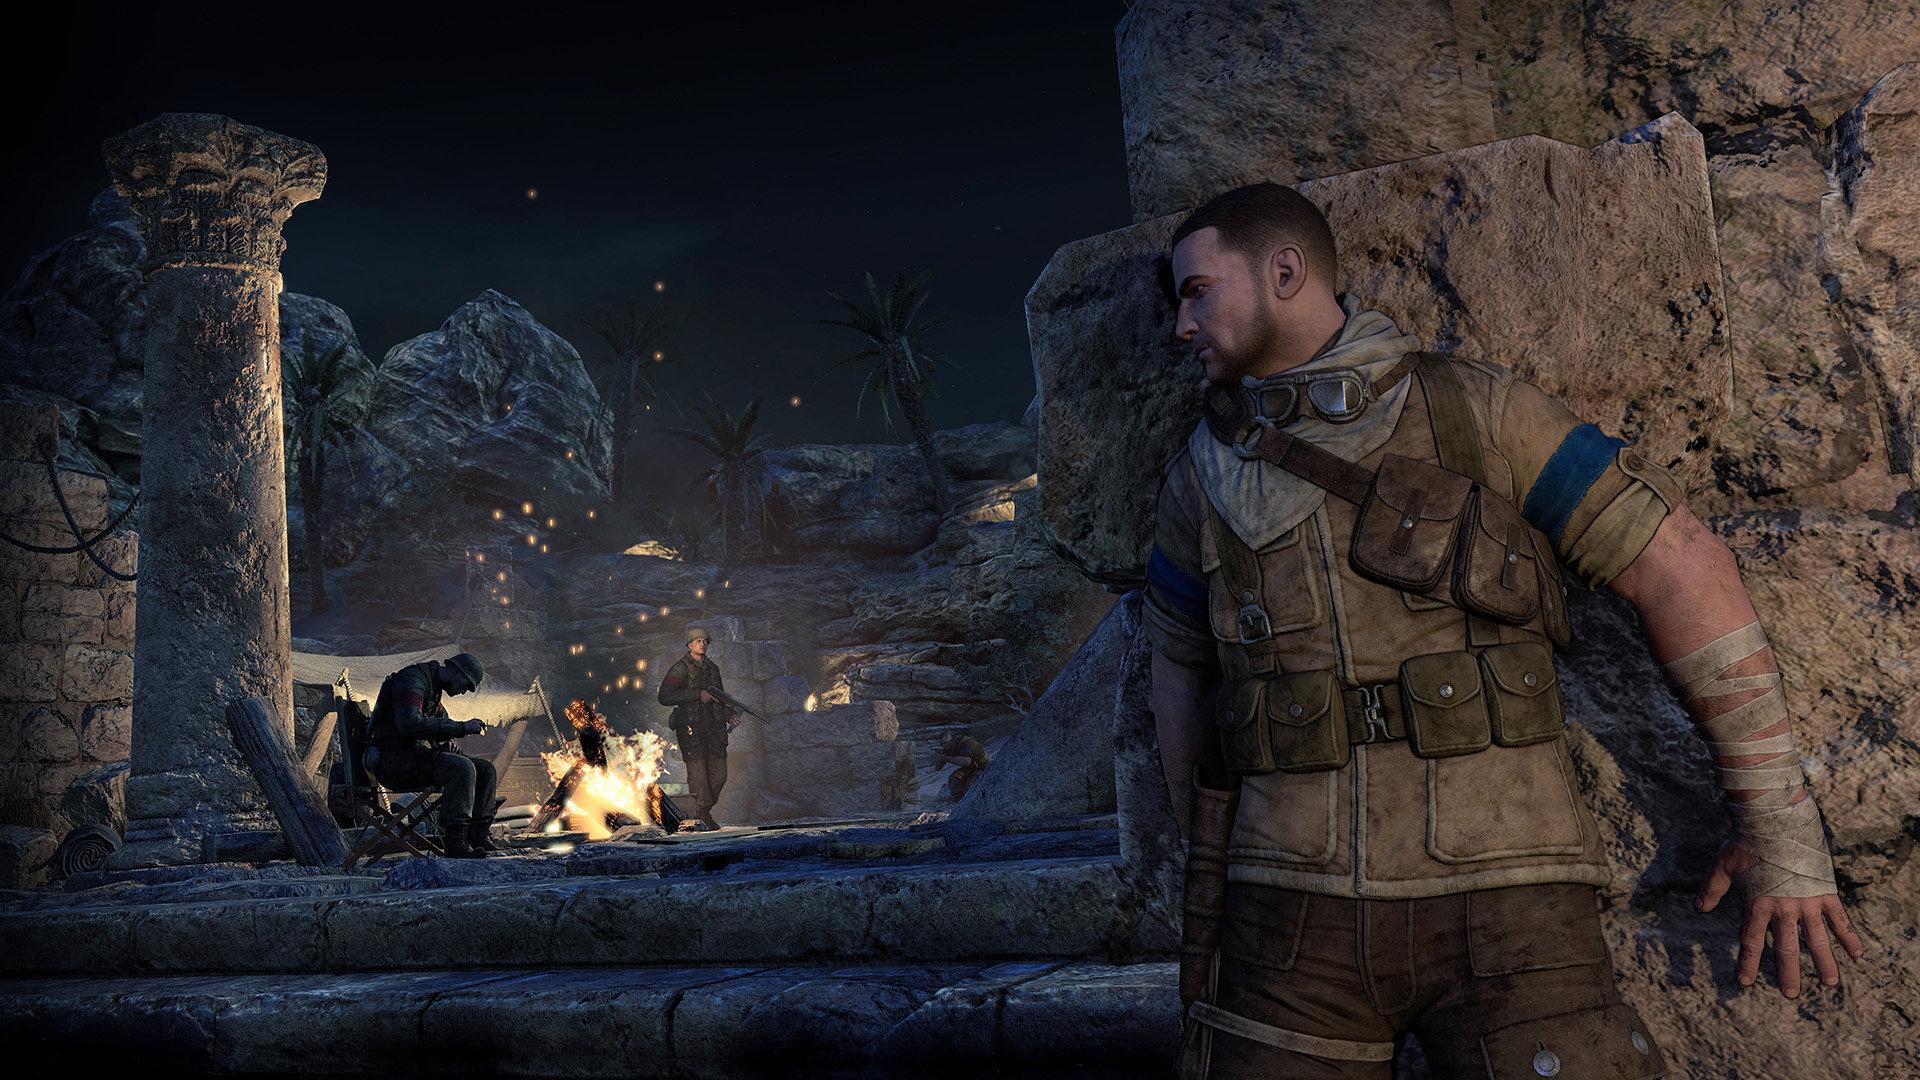 sniper-elite-3-screenshot-03-ps4-us-12ju